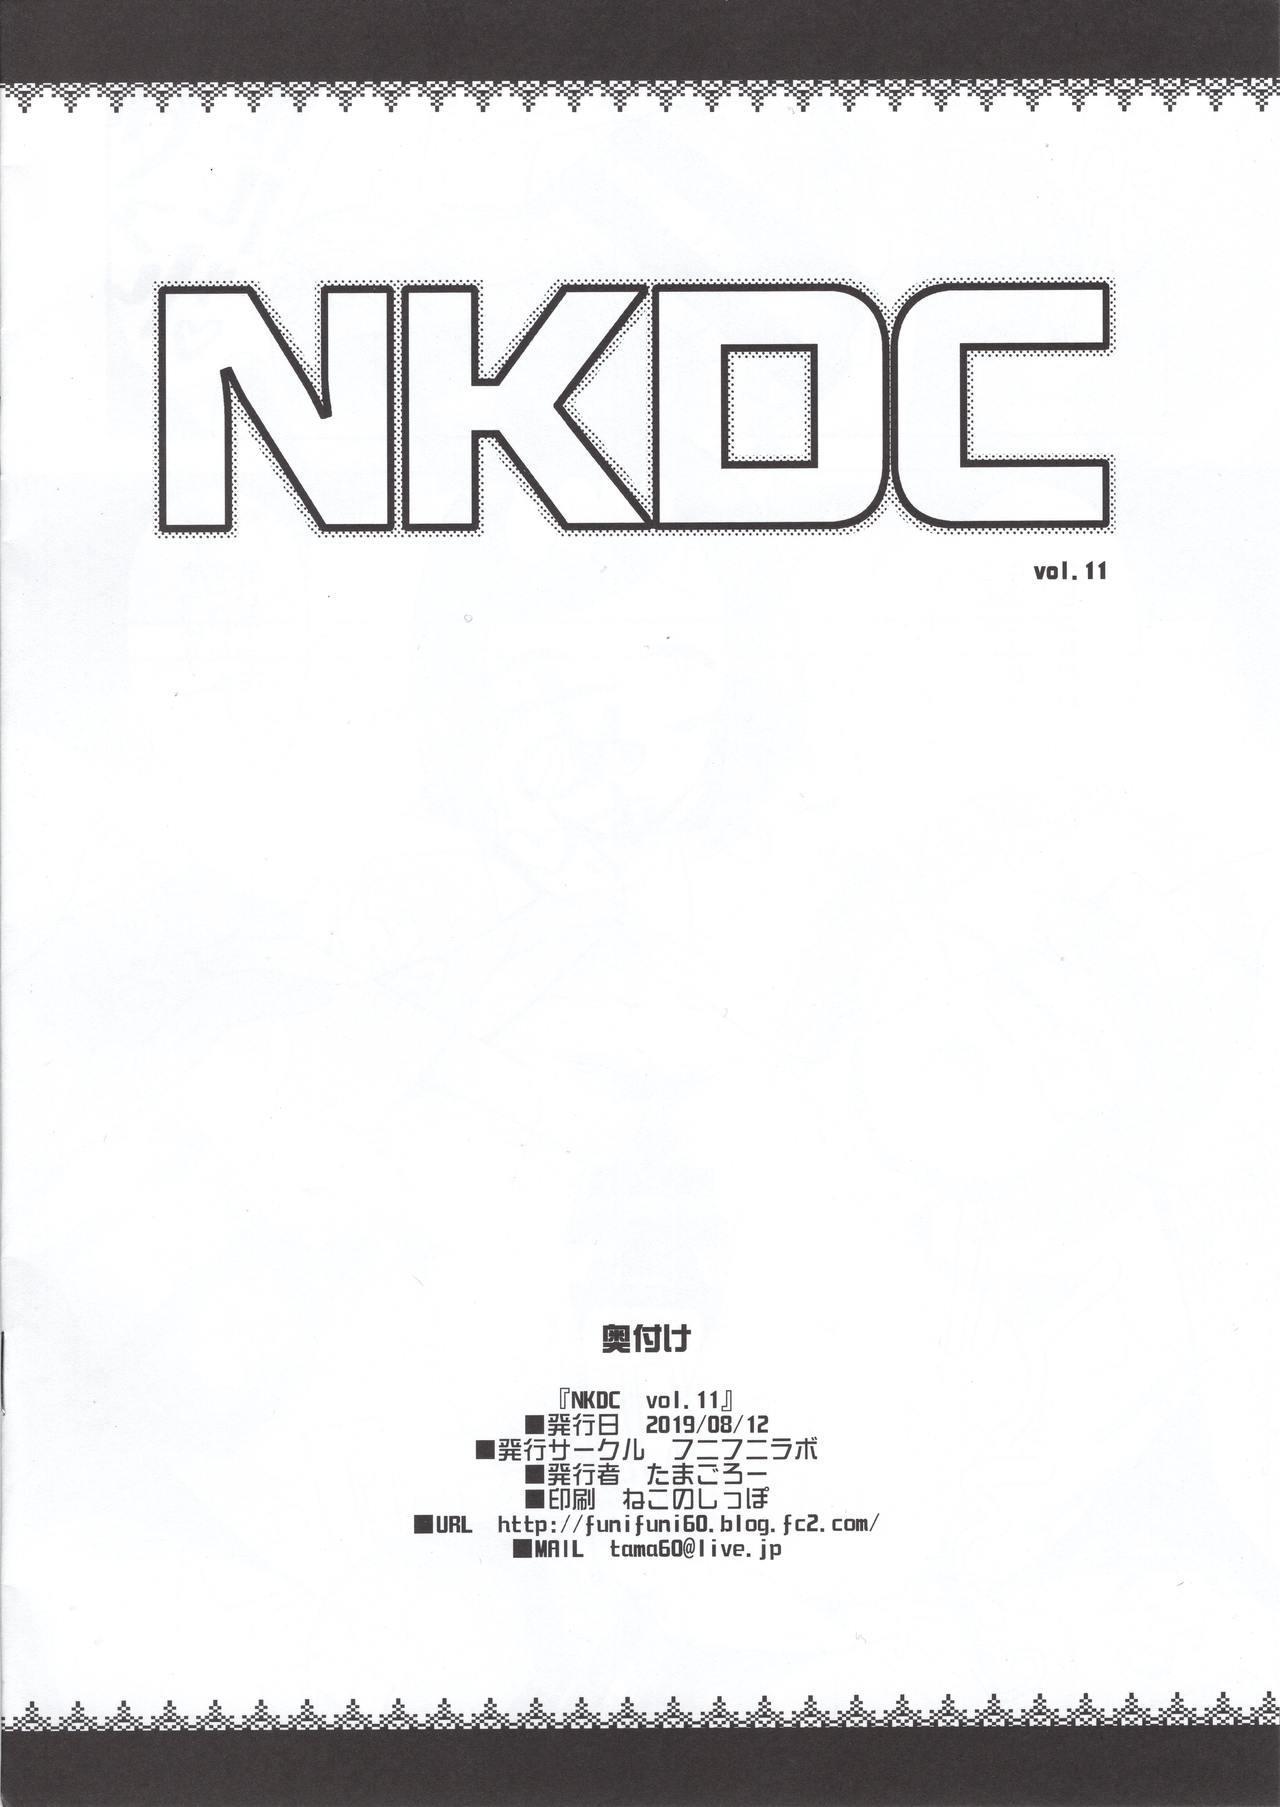 LittleBitchPlanet Vol. 4 + NKDC Vol. 11 35